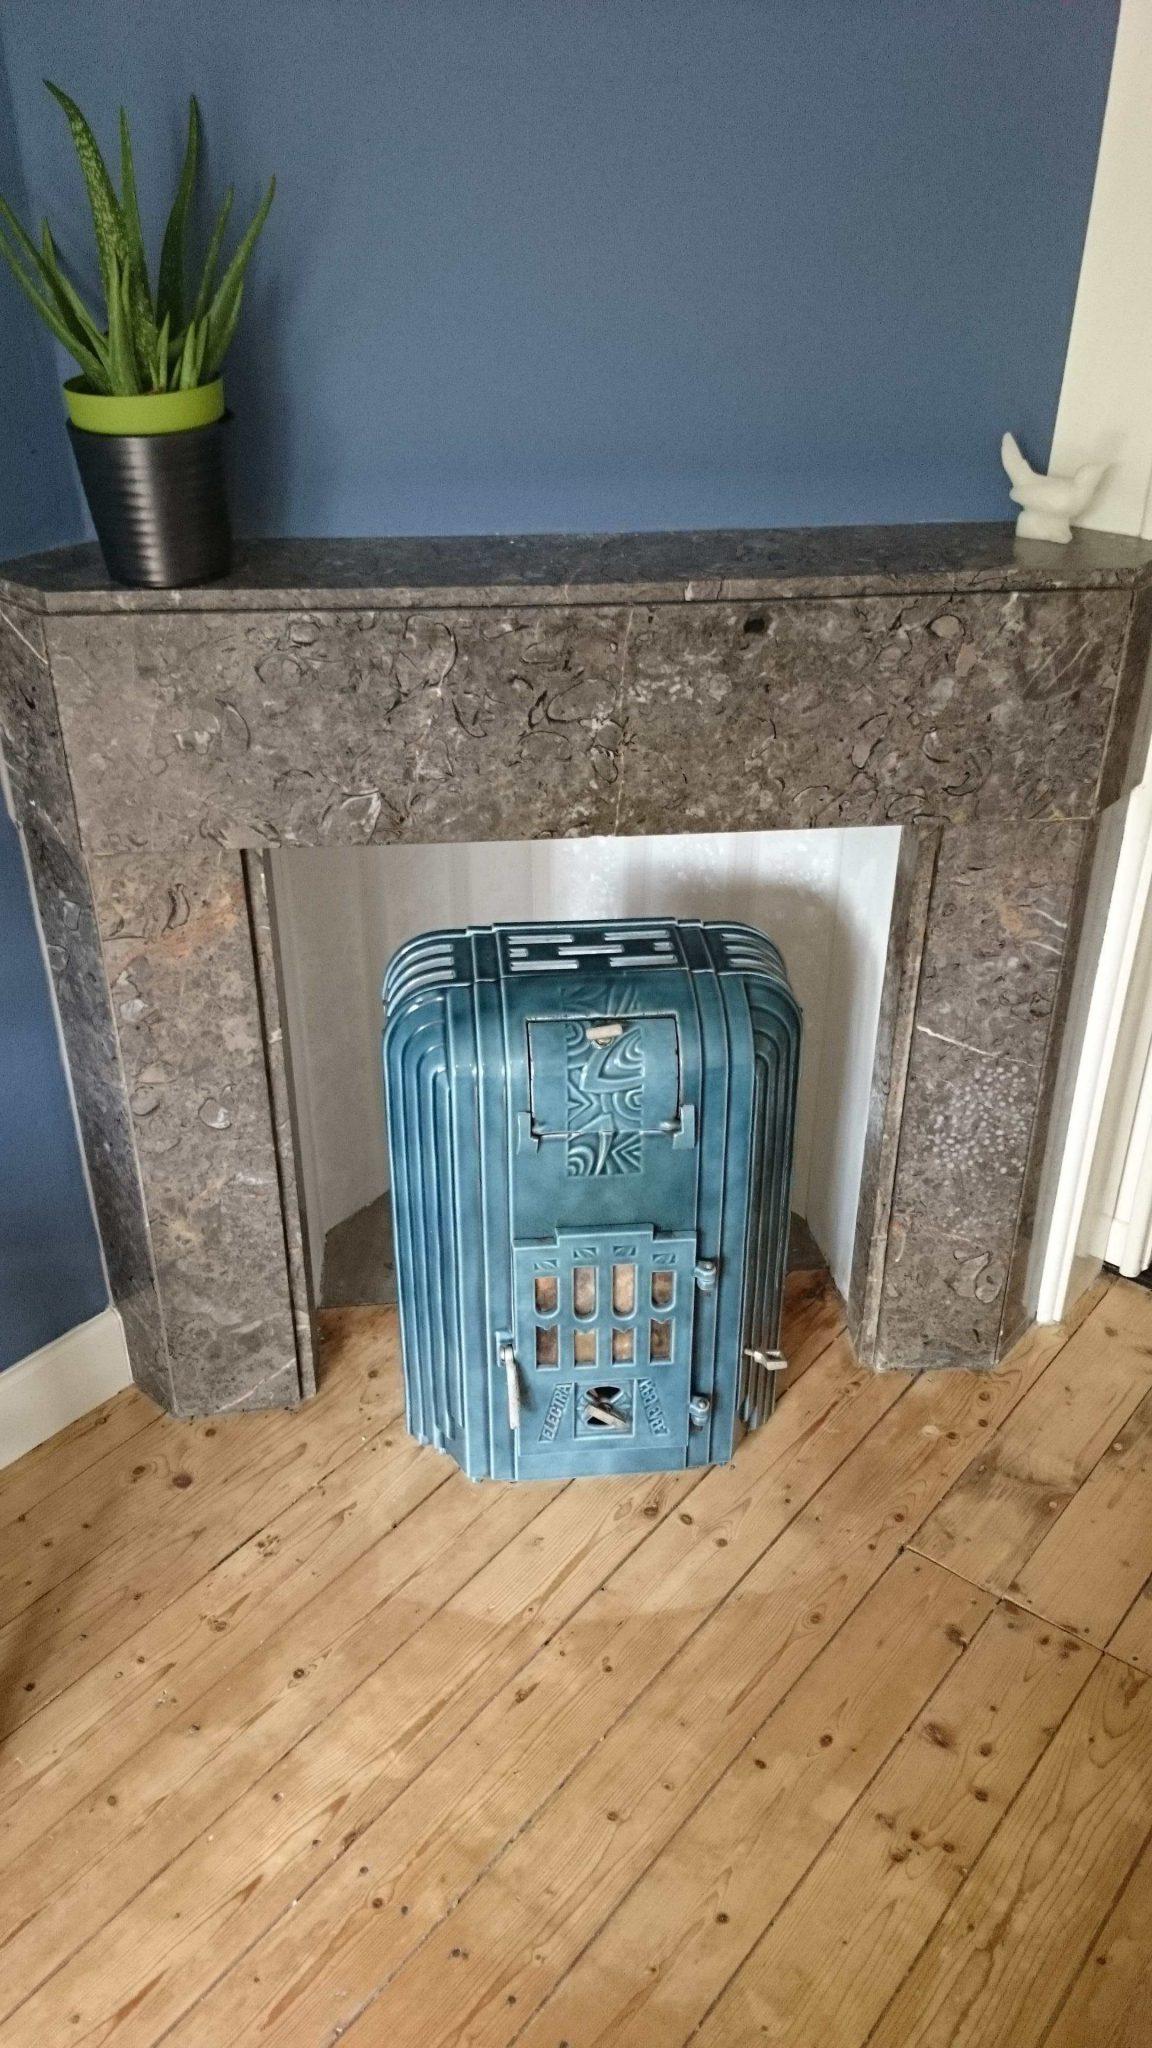 houten vloer verven in matte kleuren moose f rg. Black Bedroom Furniture Sets. Home Design Ideas